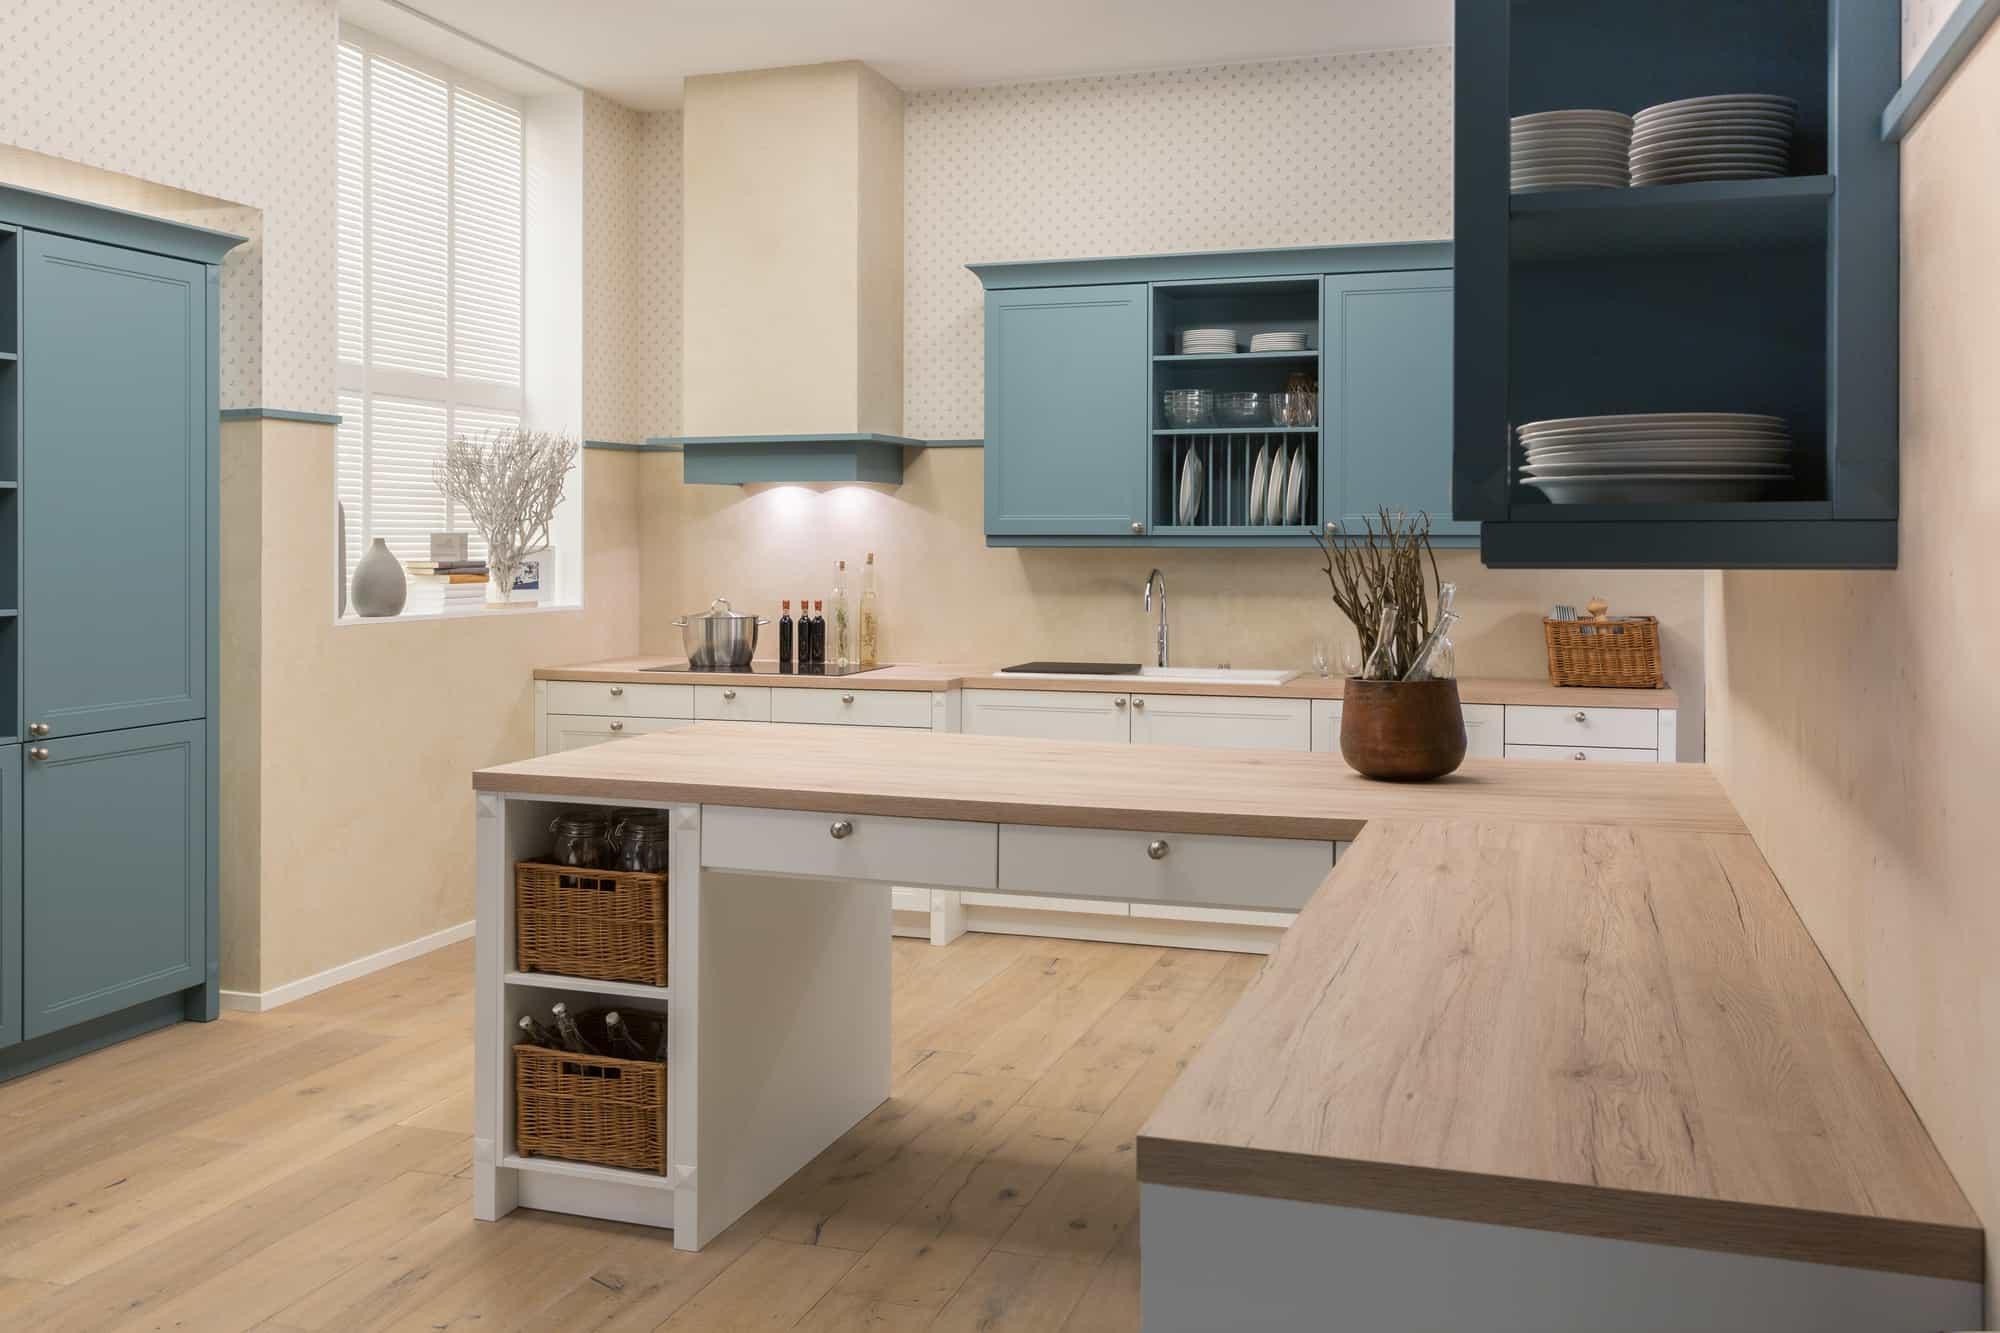 kitchen countertop solution